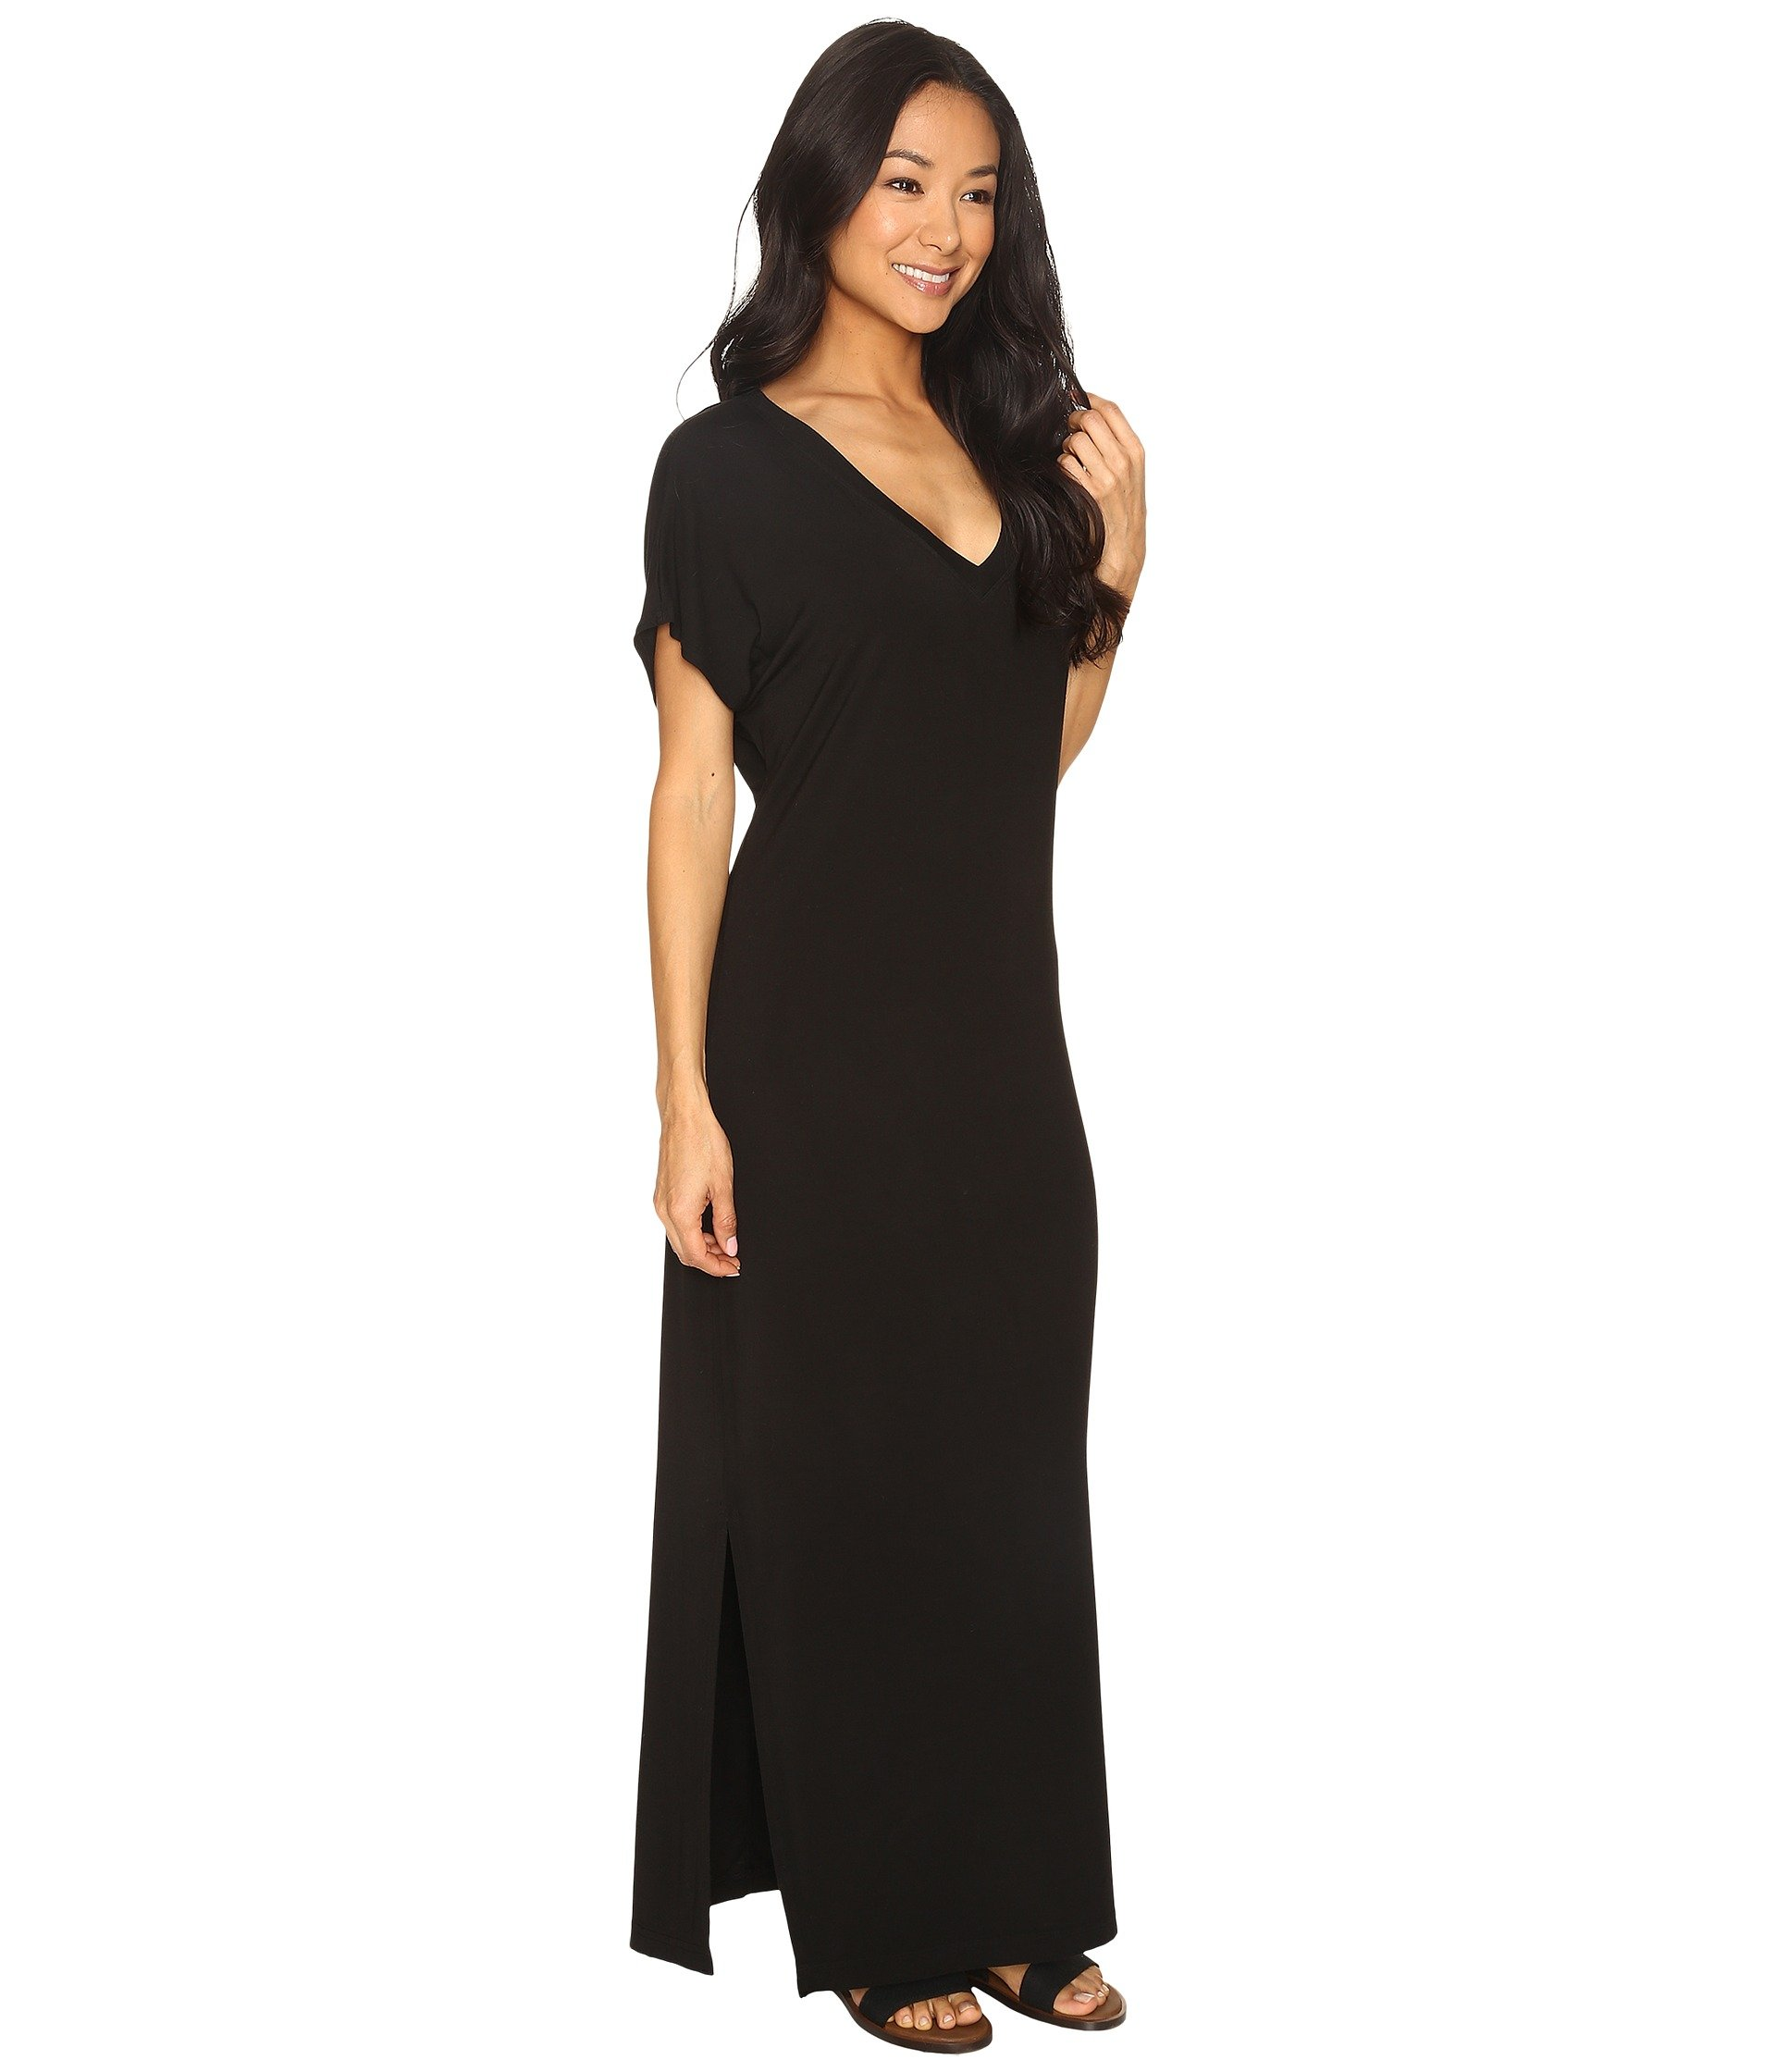 Maxi Tail Tee Every Hard Dress Day Black na7qcPp1